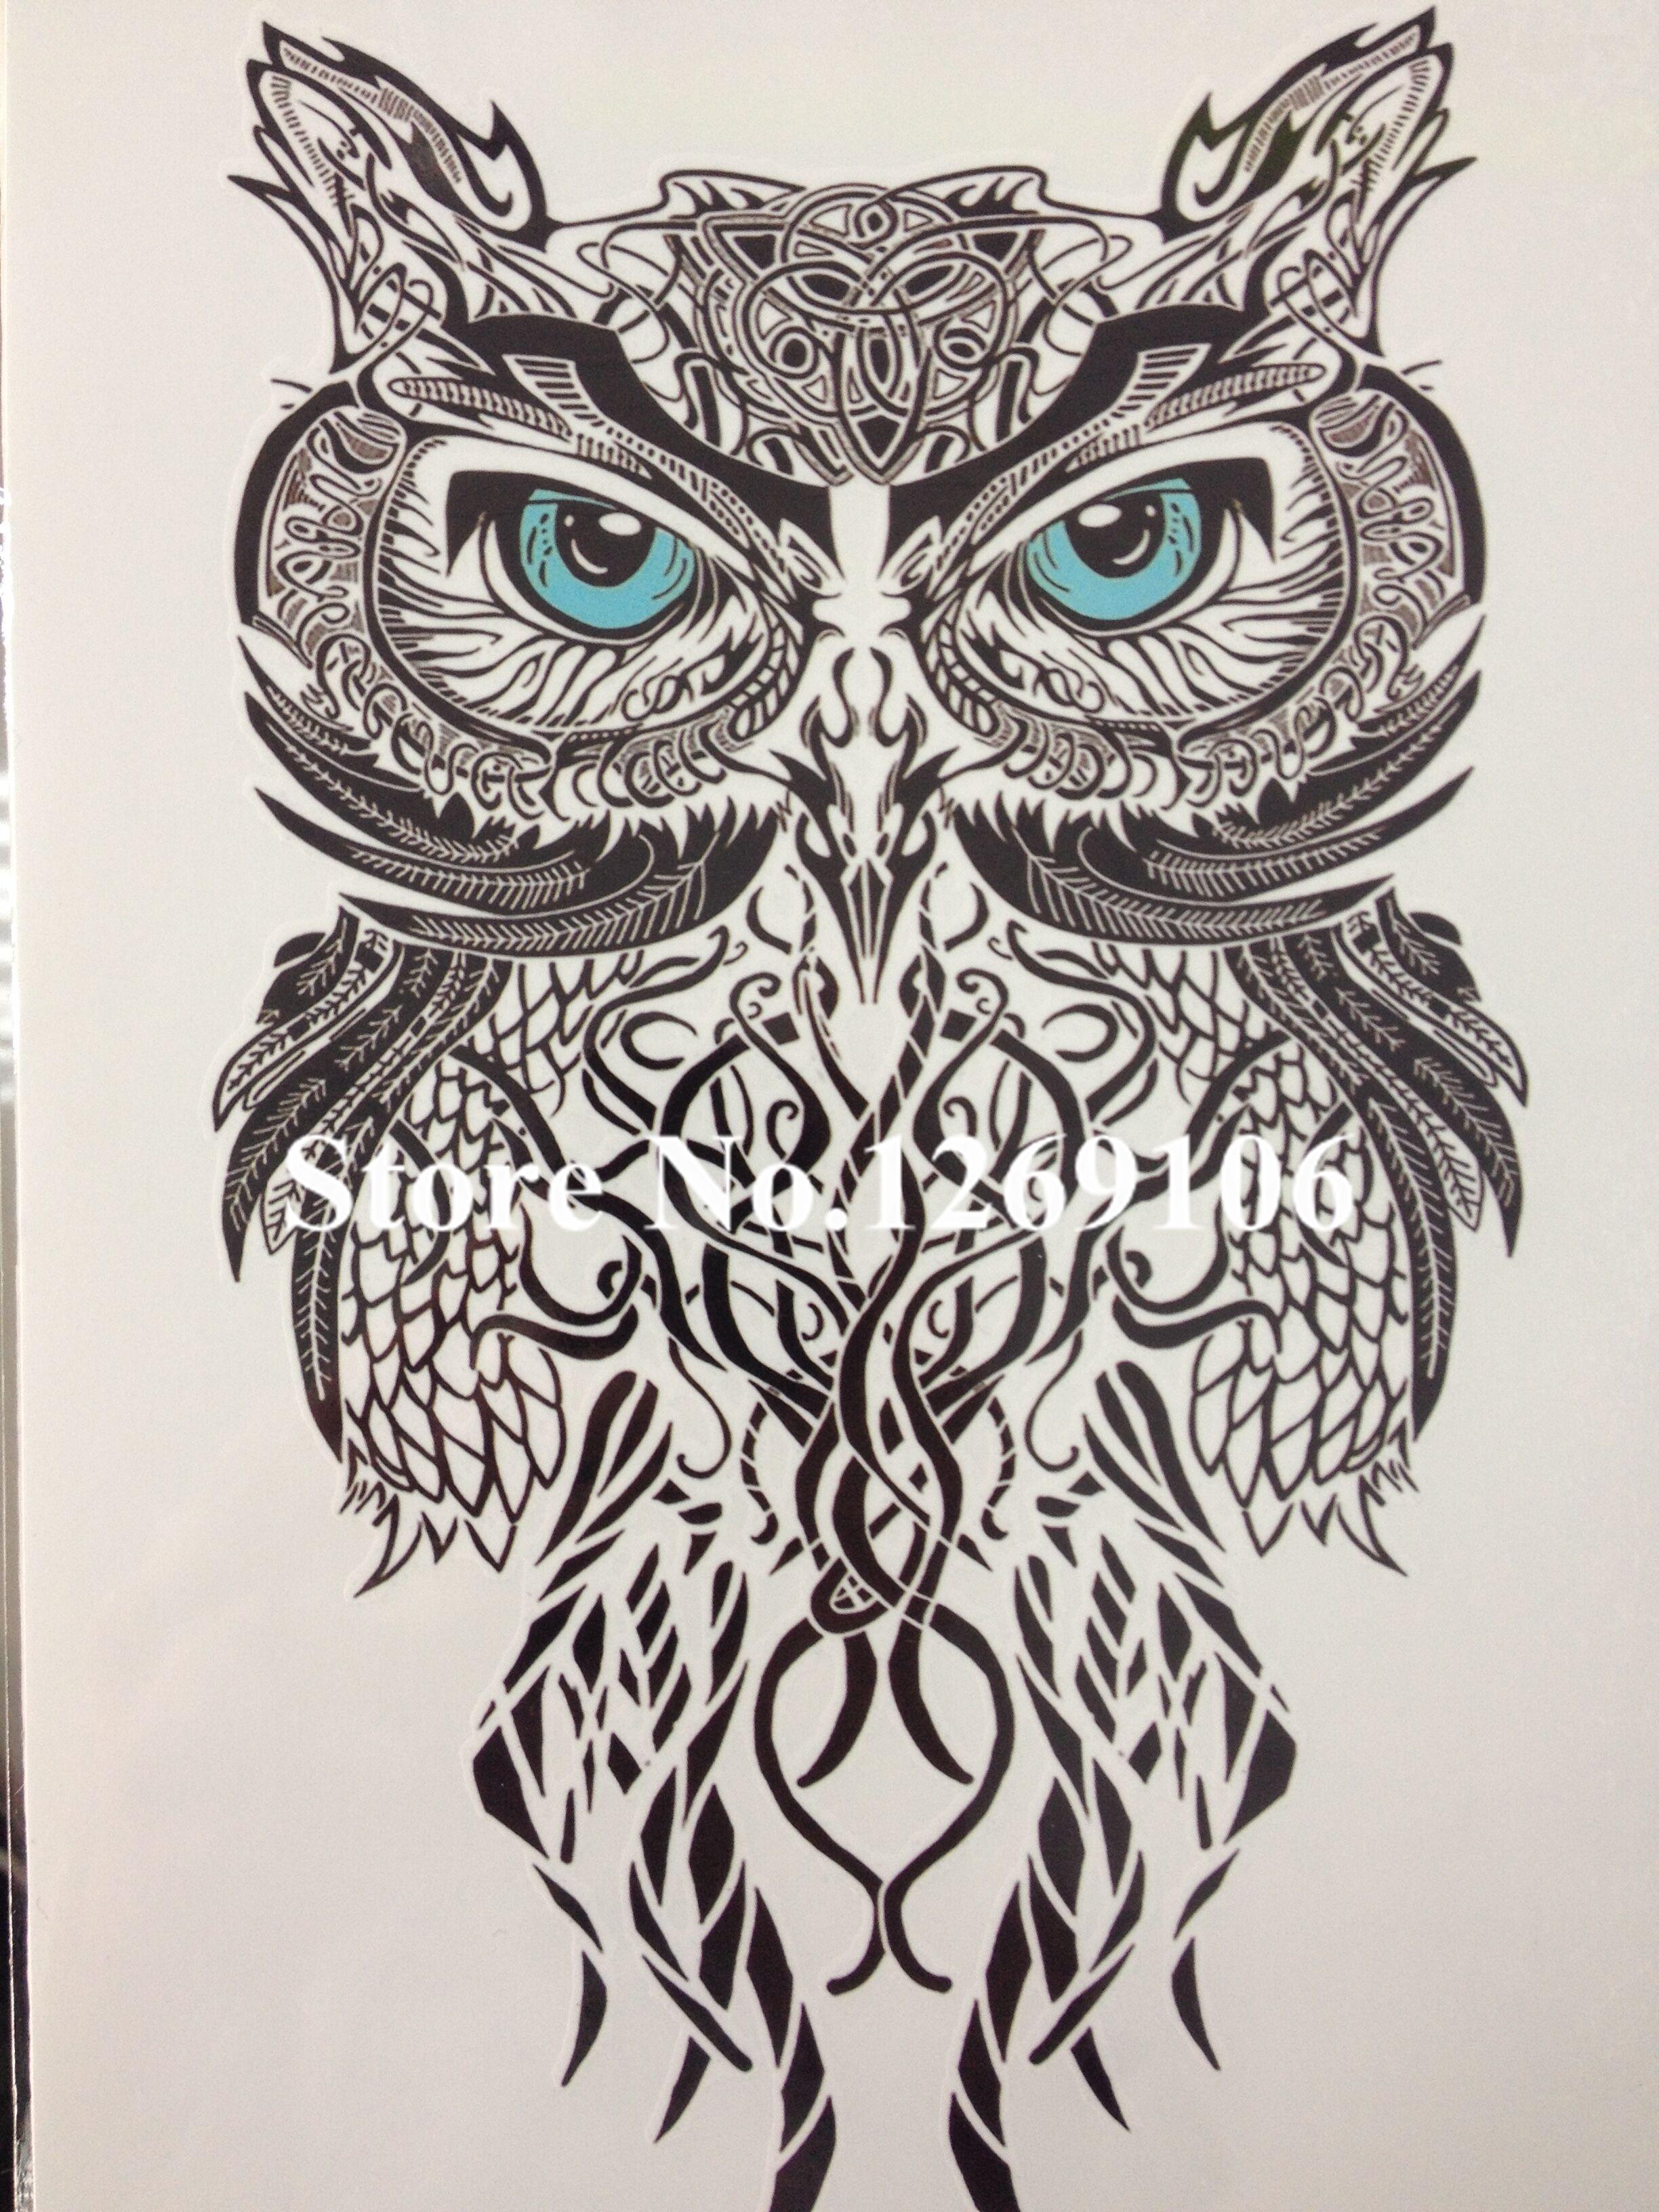 Simple Blue Eye OWL Hot Sale 21 X 15 CM Temporary Tattoo Stickers Temporary Body Art  Waterproof #58